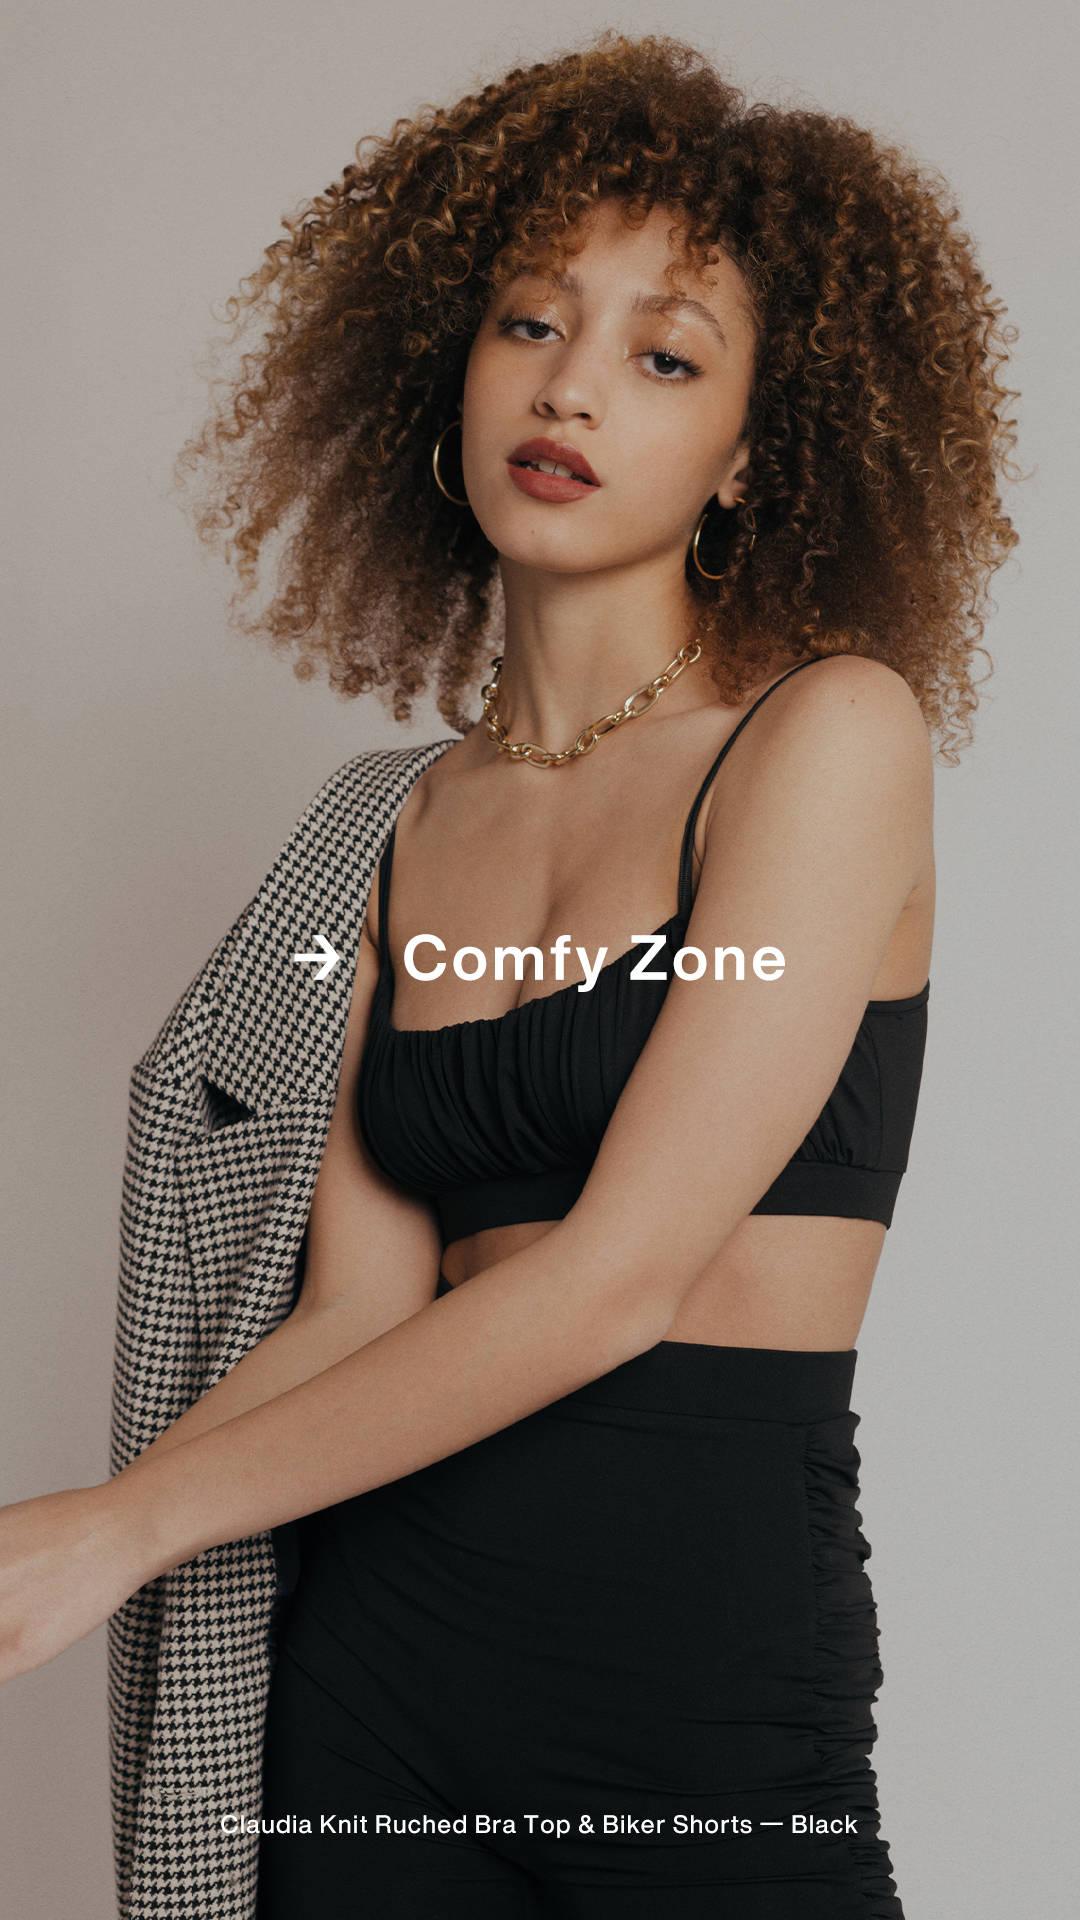 Comfy Zone